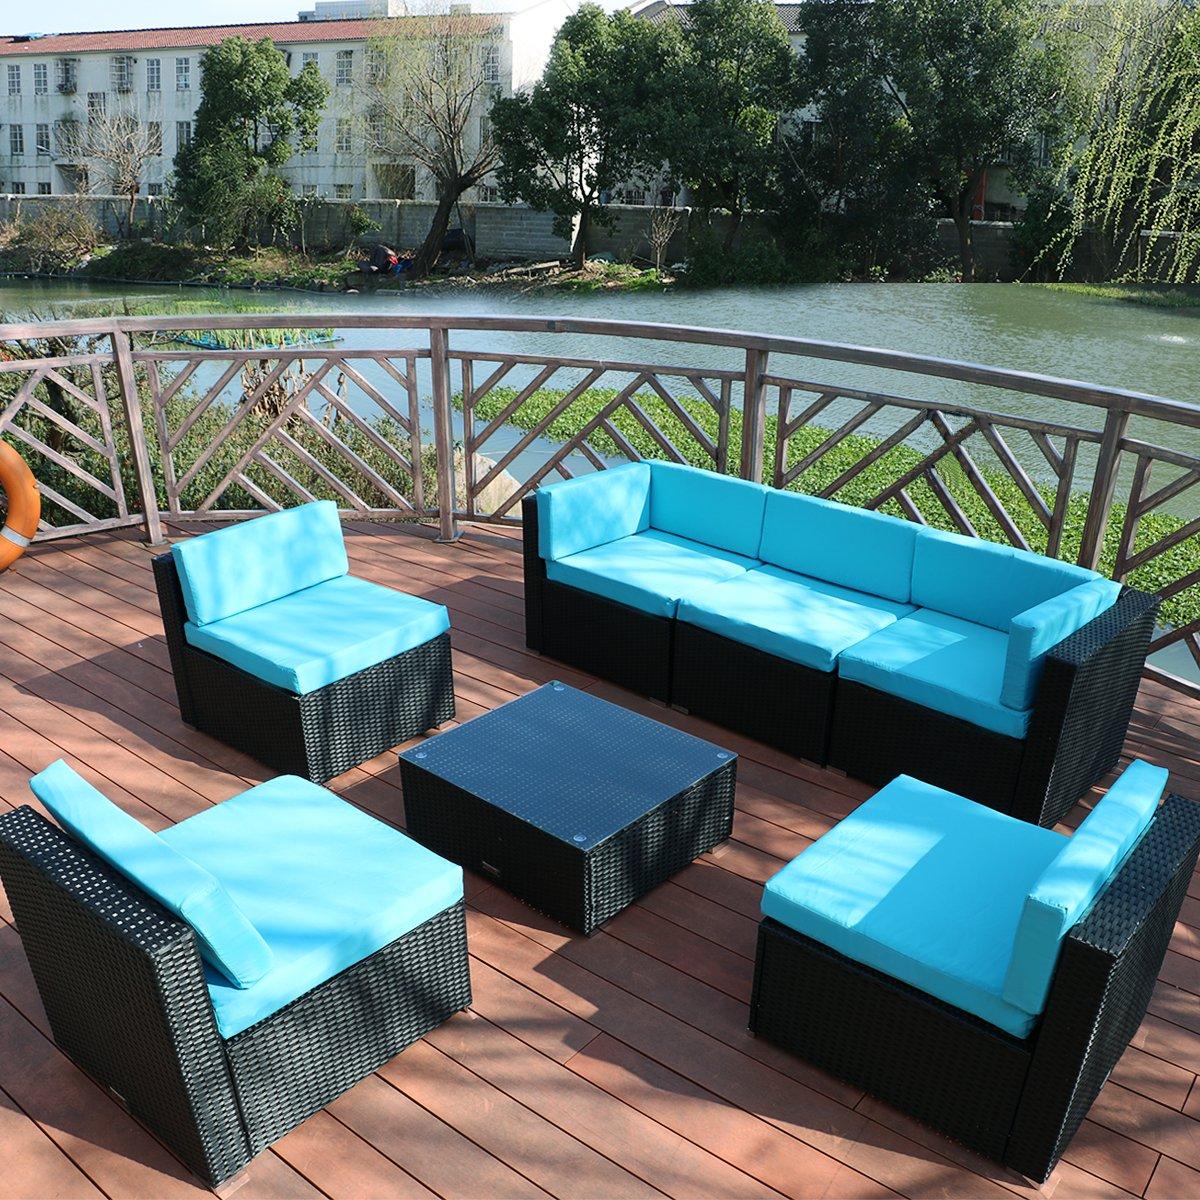 Yardeen 7 Piece Outdoor Patio Furniture Rattan Wicker